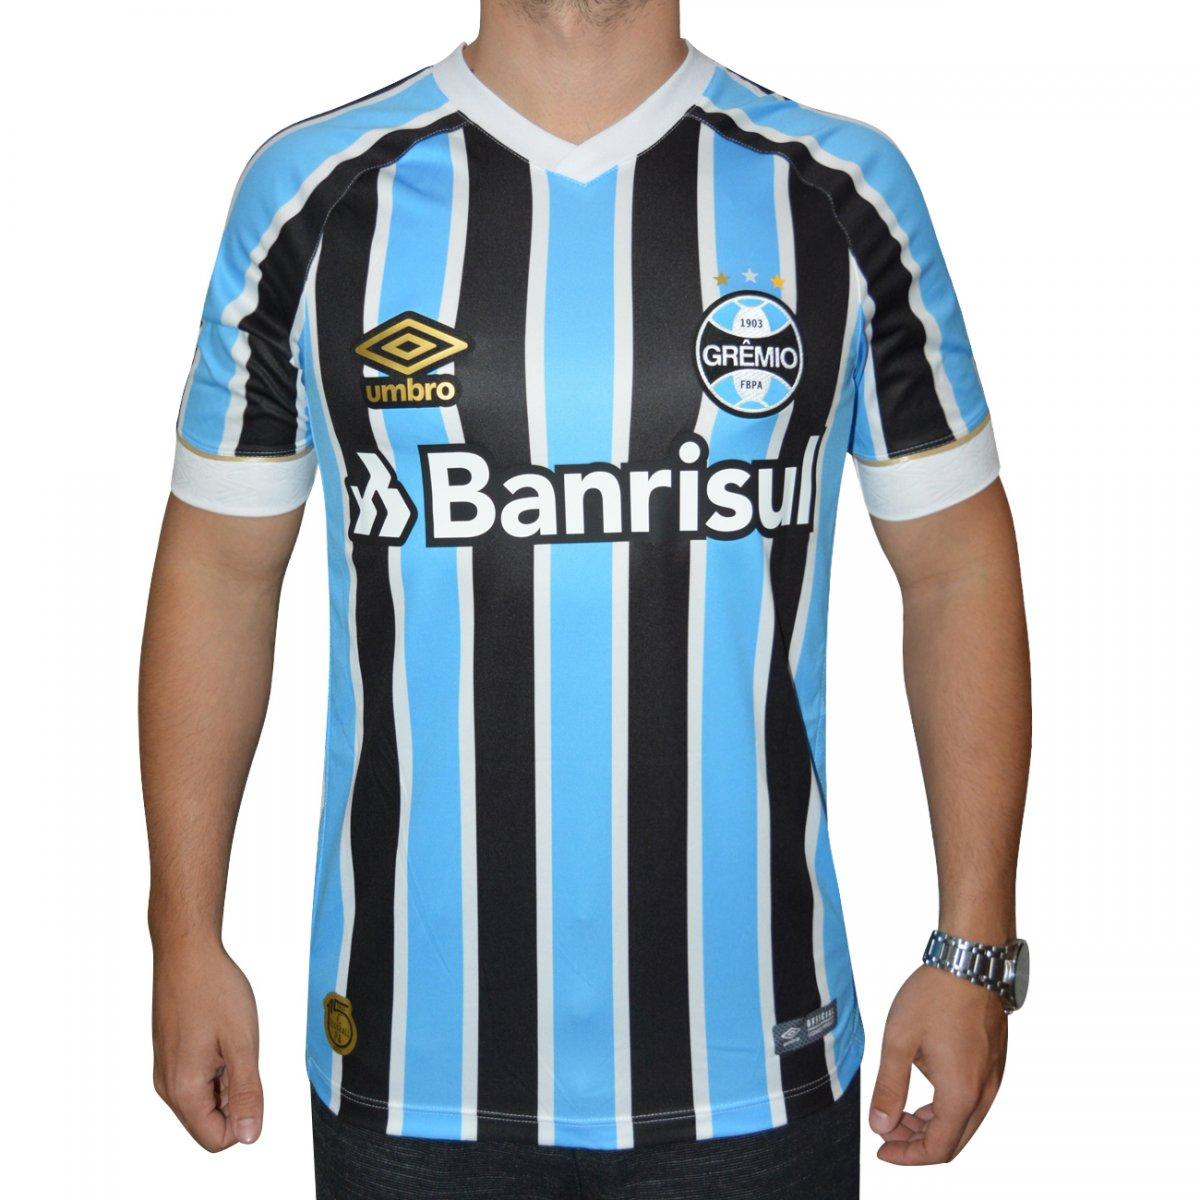 Camisa Gremio Umbro 2018 Game 778215 - Tricolor - Chuteira Nike ... 356baff7baadc